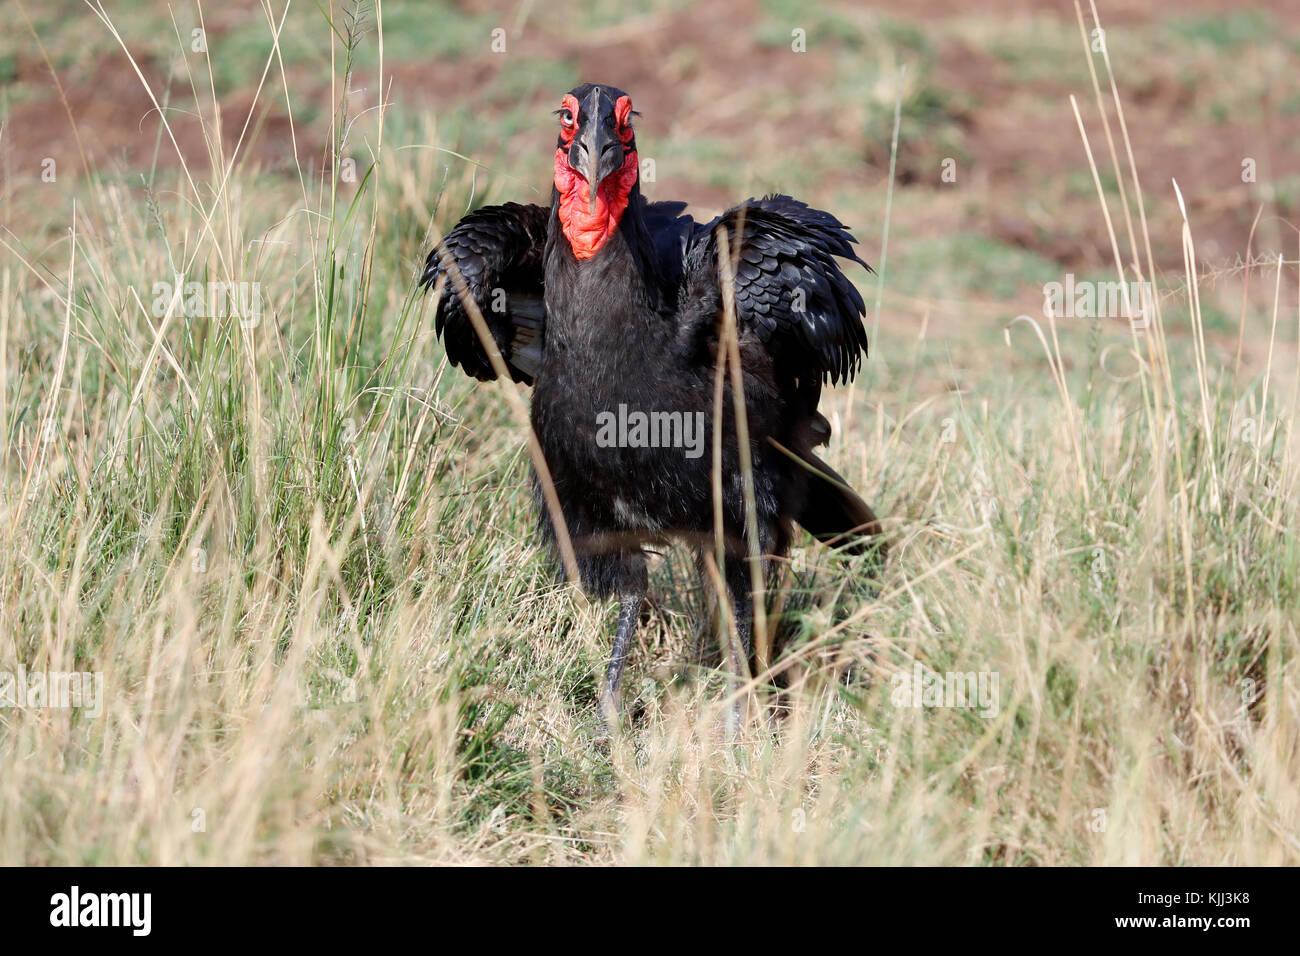 Southern ground hornbill (Bucorvus leadbeateri).  Masai Mara game reserve. Kenya. Stock Photo